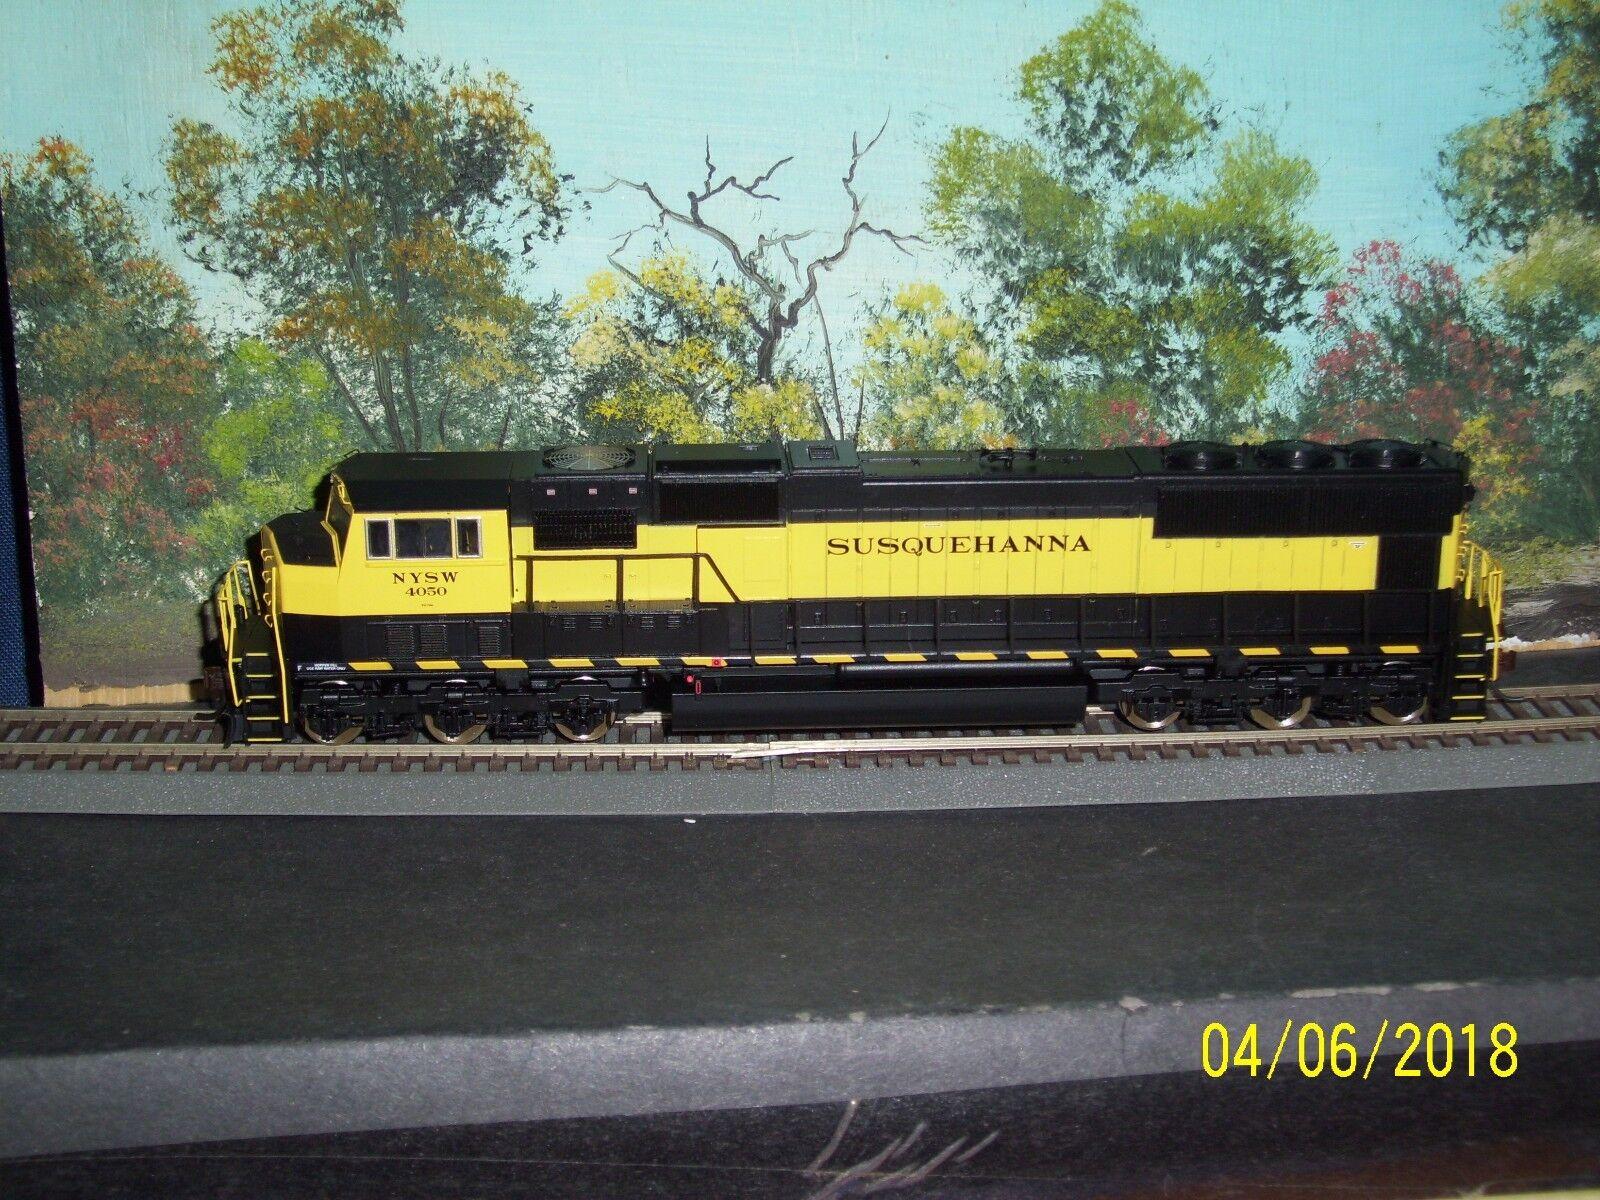 Escala Ho Athearn Genesis G6183/84/85 SD70M Susquehanna 4050/52/54